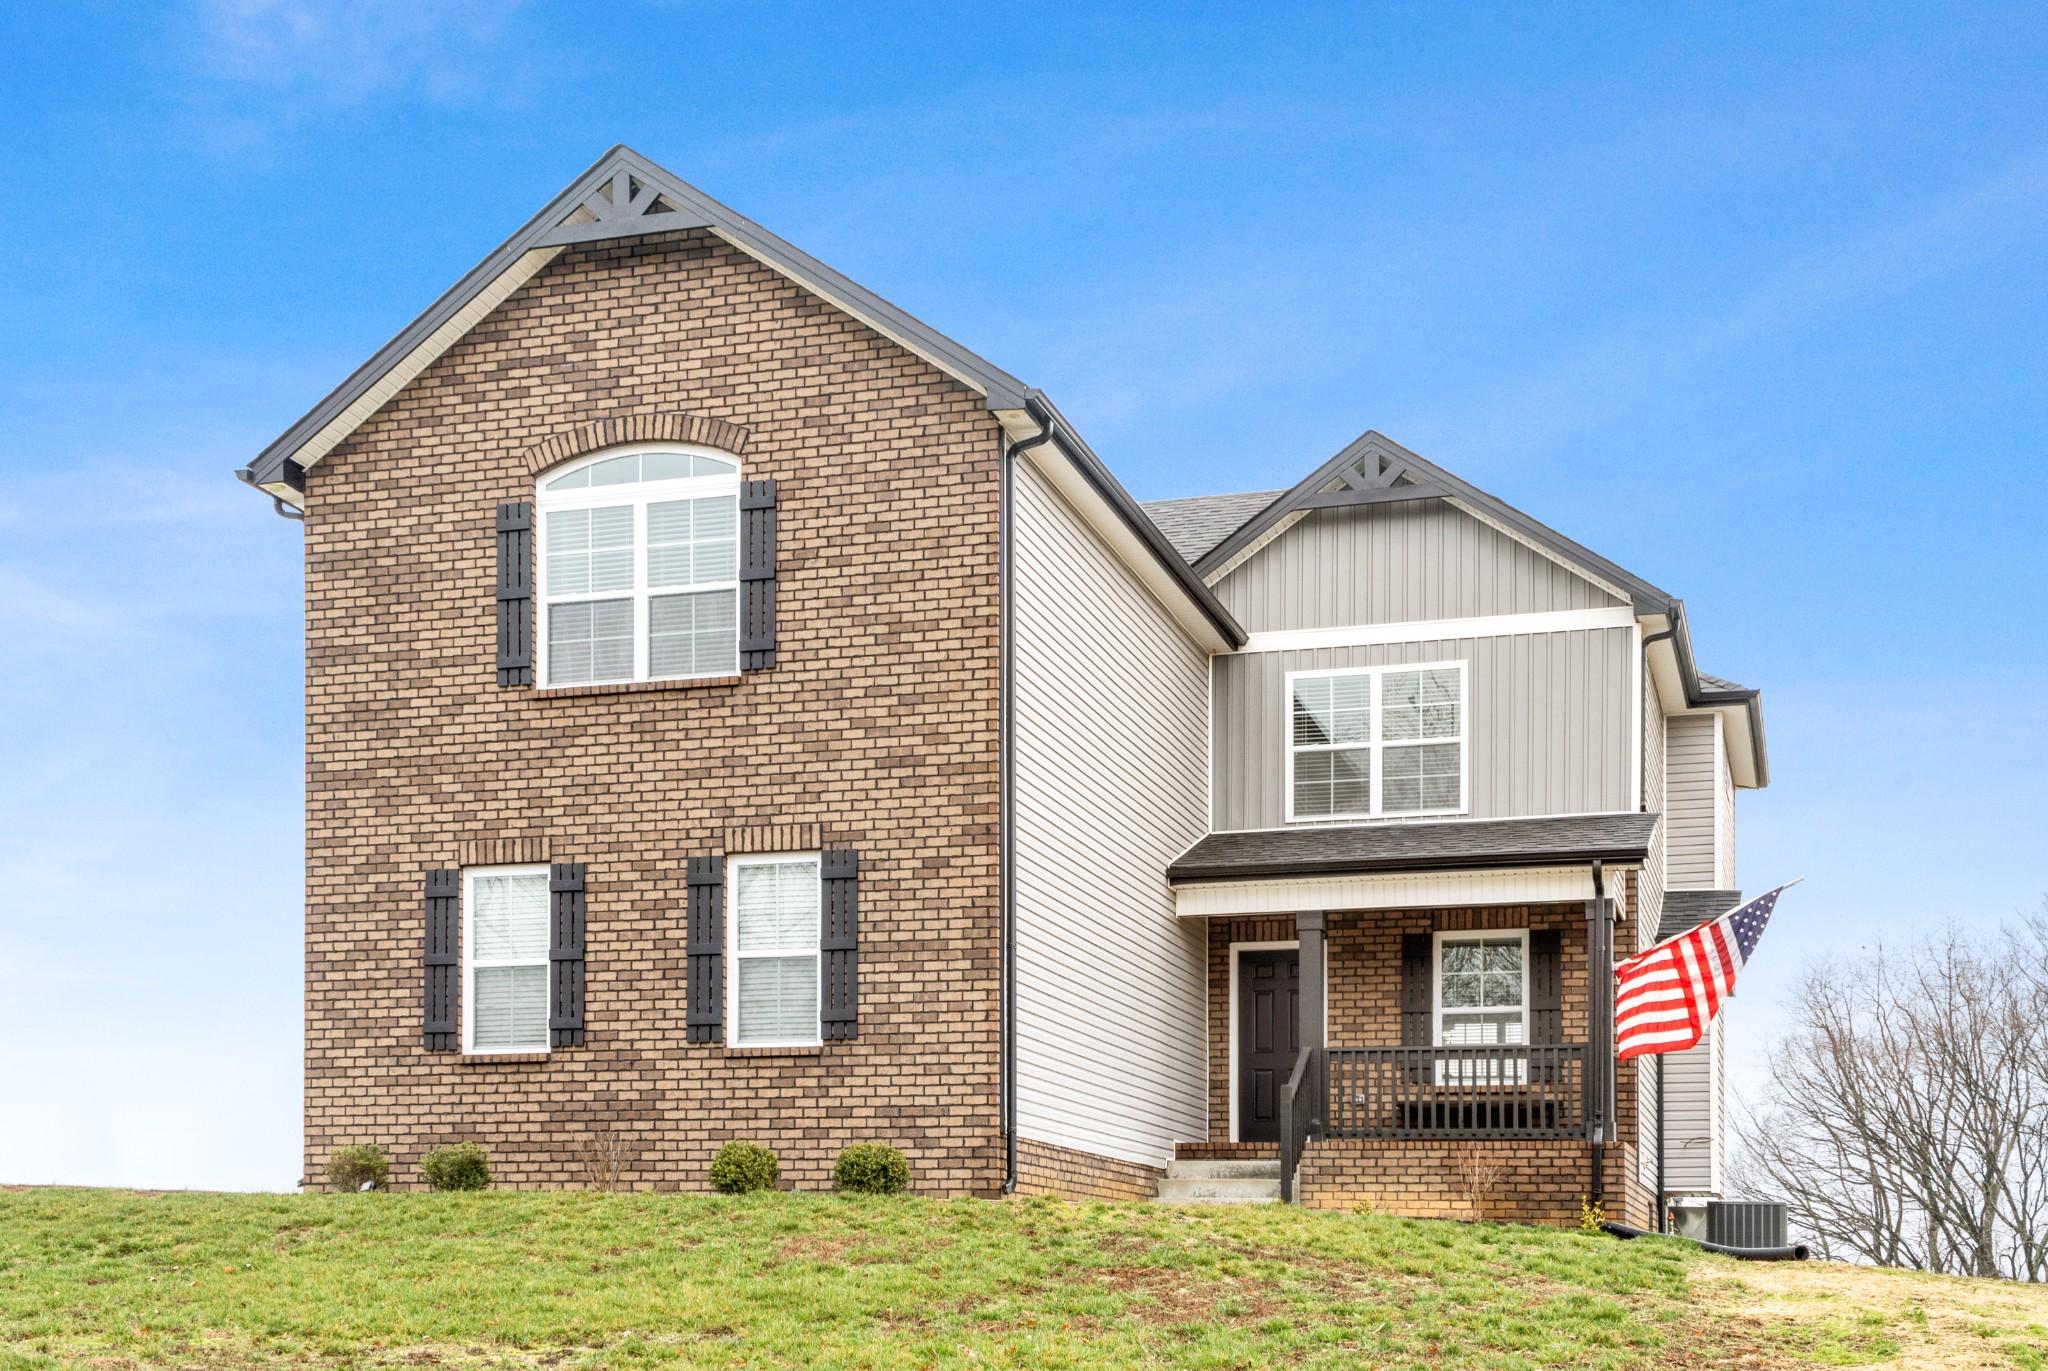 5321 Old Highway 48, Southside, TN 37171 - Southside, TN real estate listing